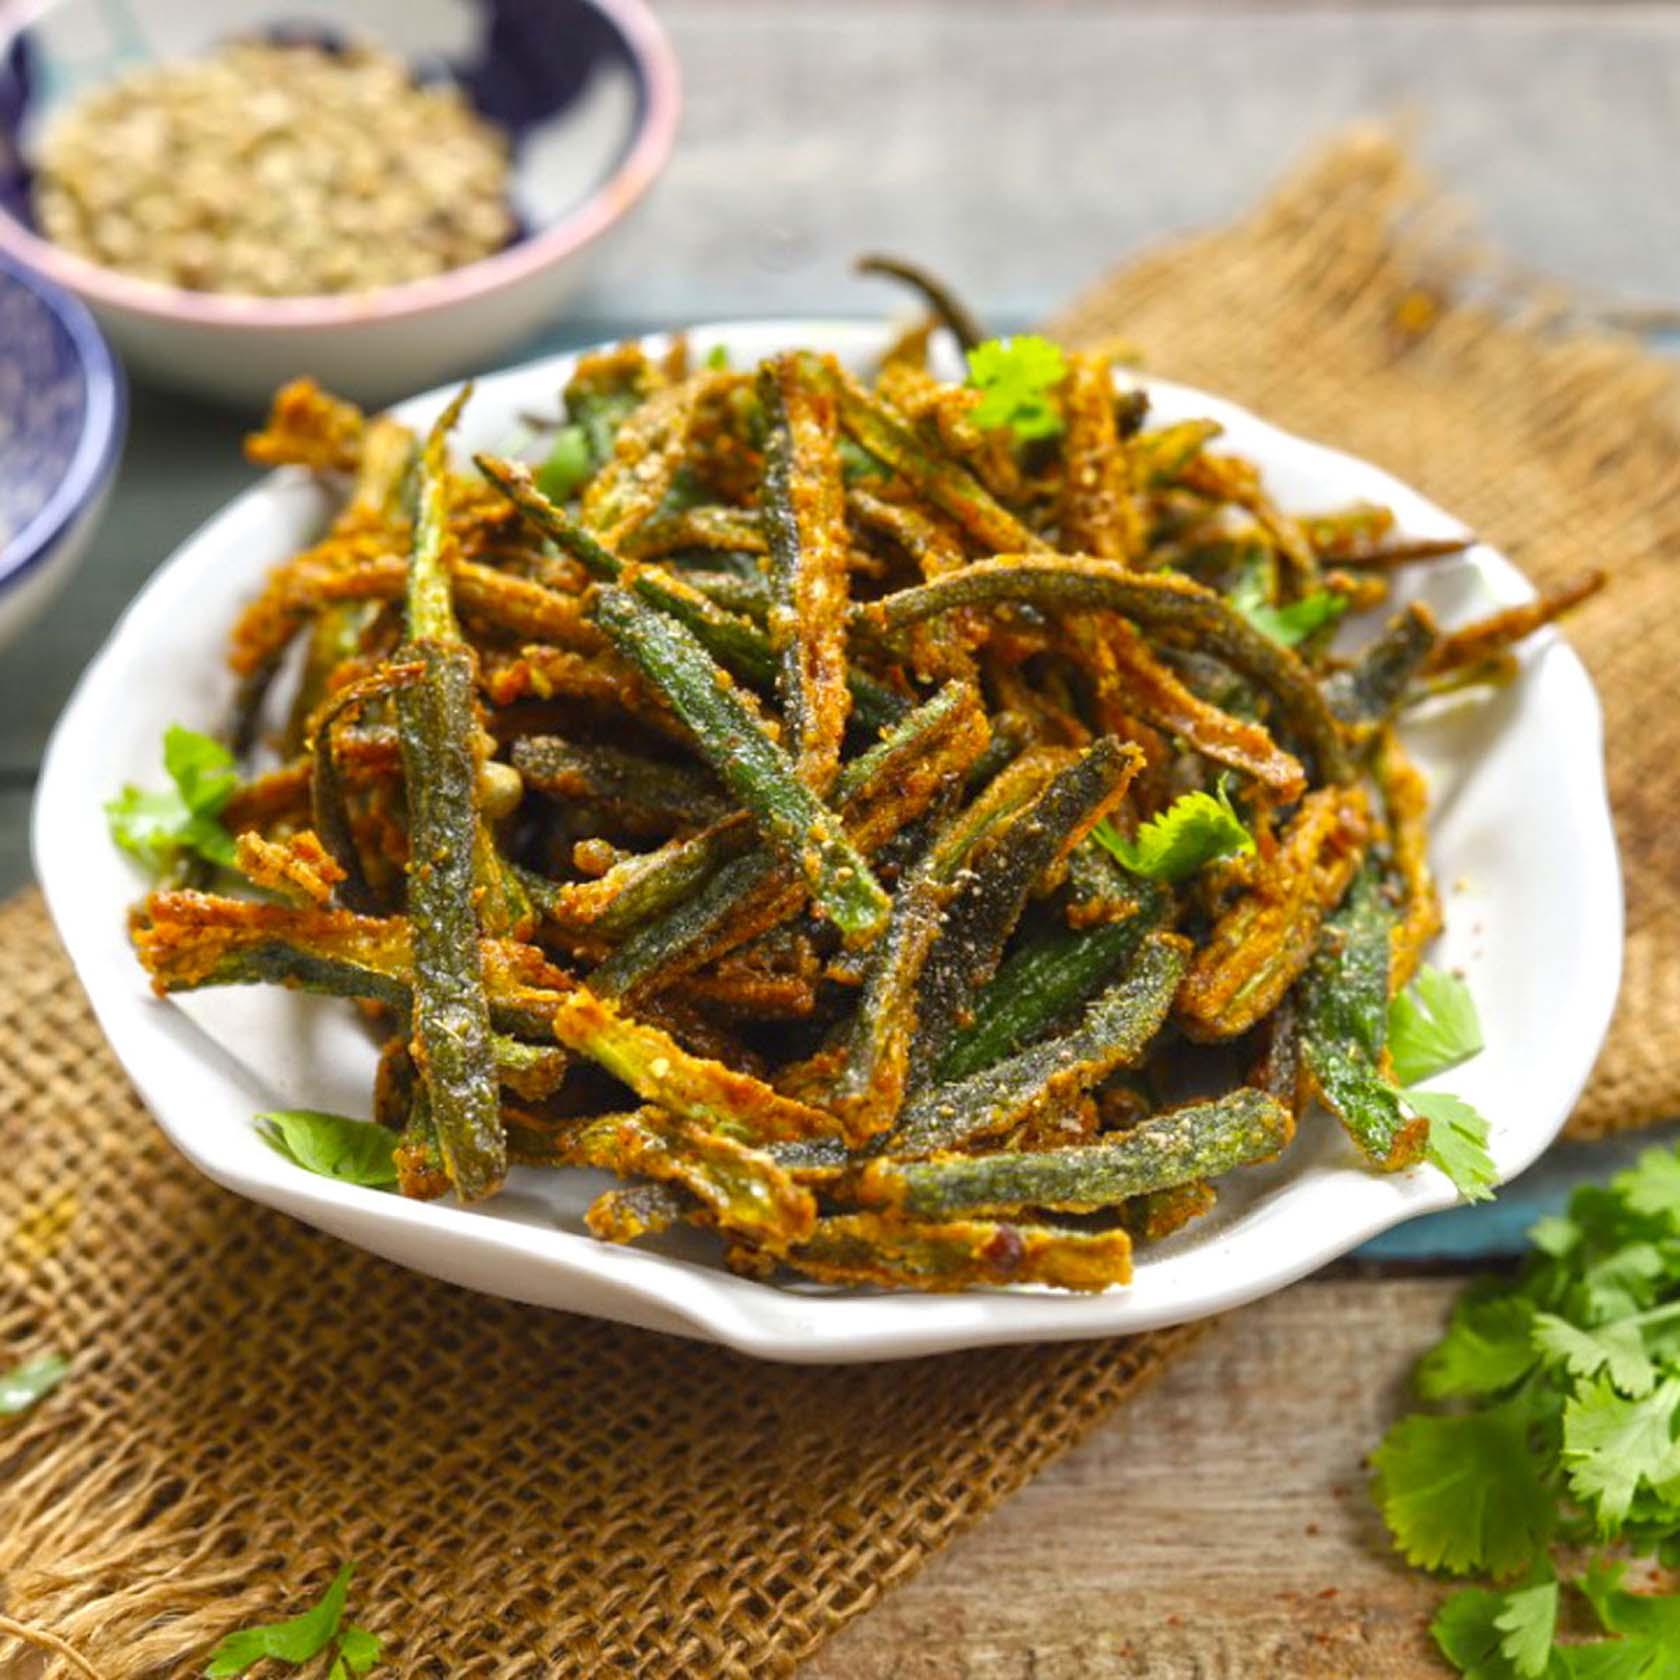 Kurkuri Bhindi Or Bhindi Fry Recipe: Crispy Okra Fry